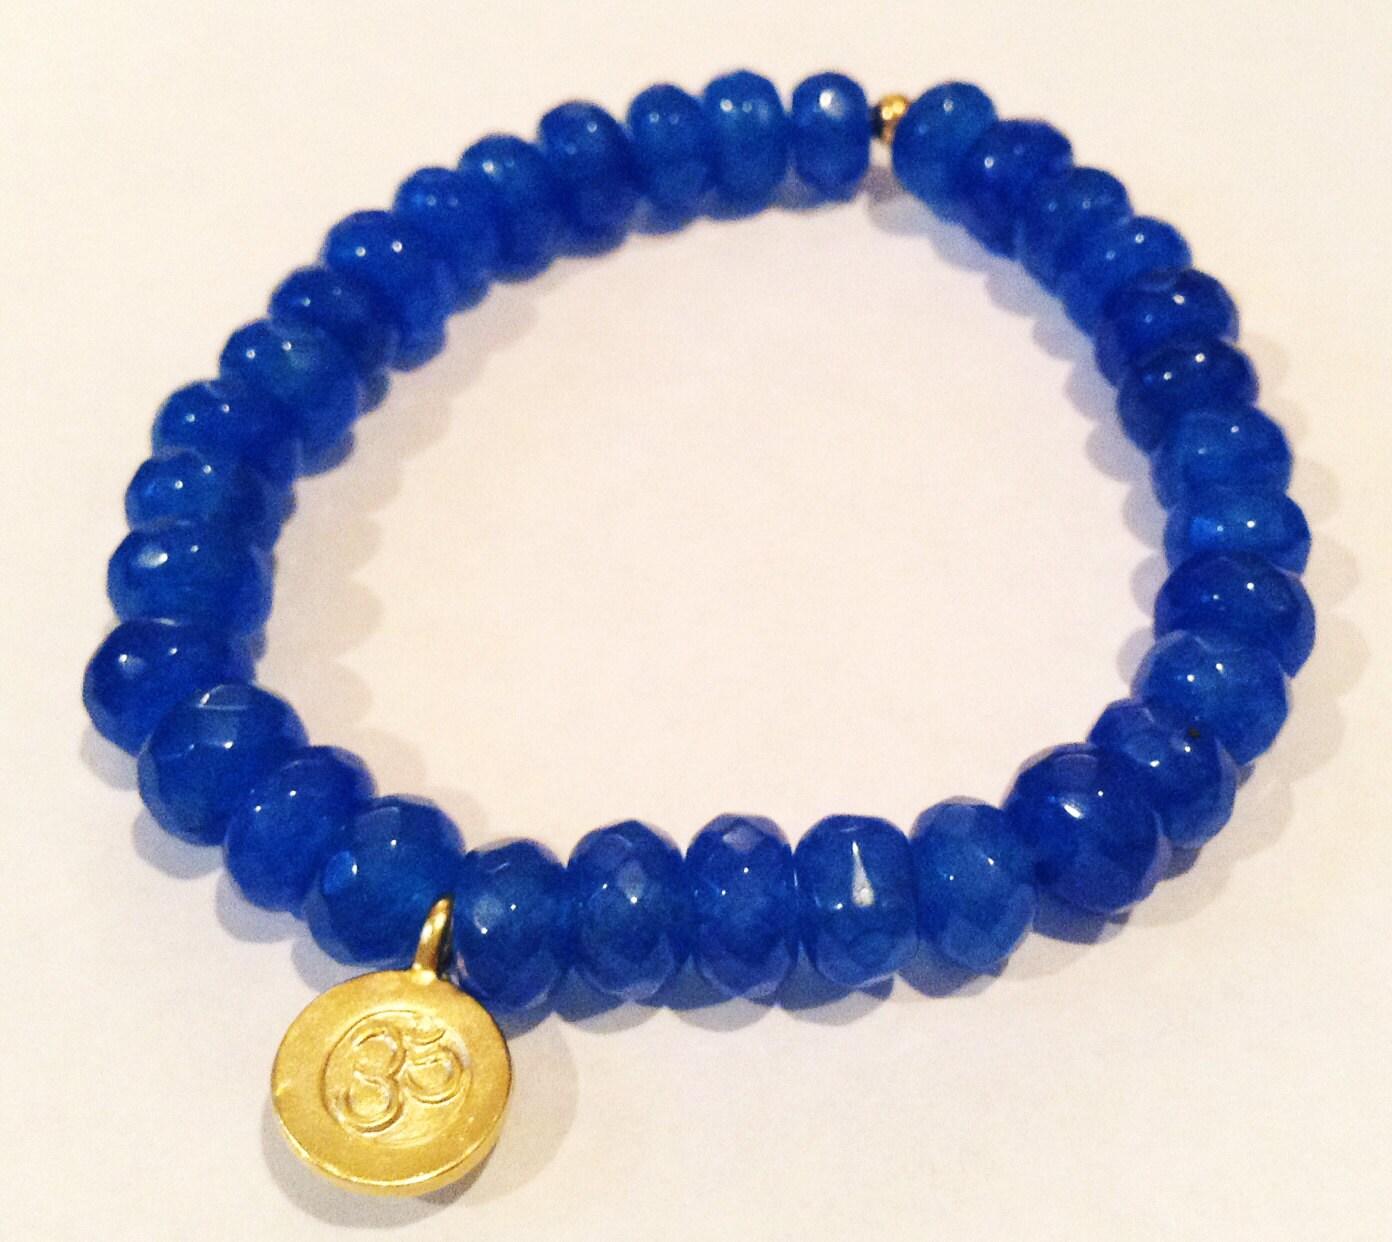 Jade Bracelet Beads: Blue JADE Bead Stretch BRACELET With Gold By SummerStoneDesign